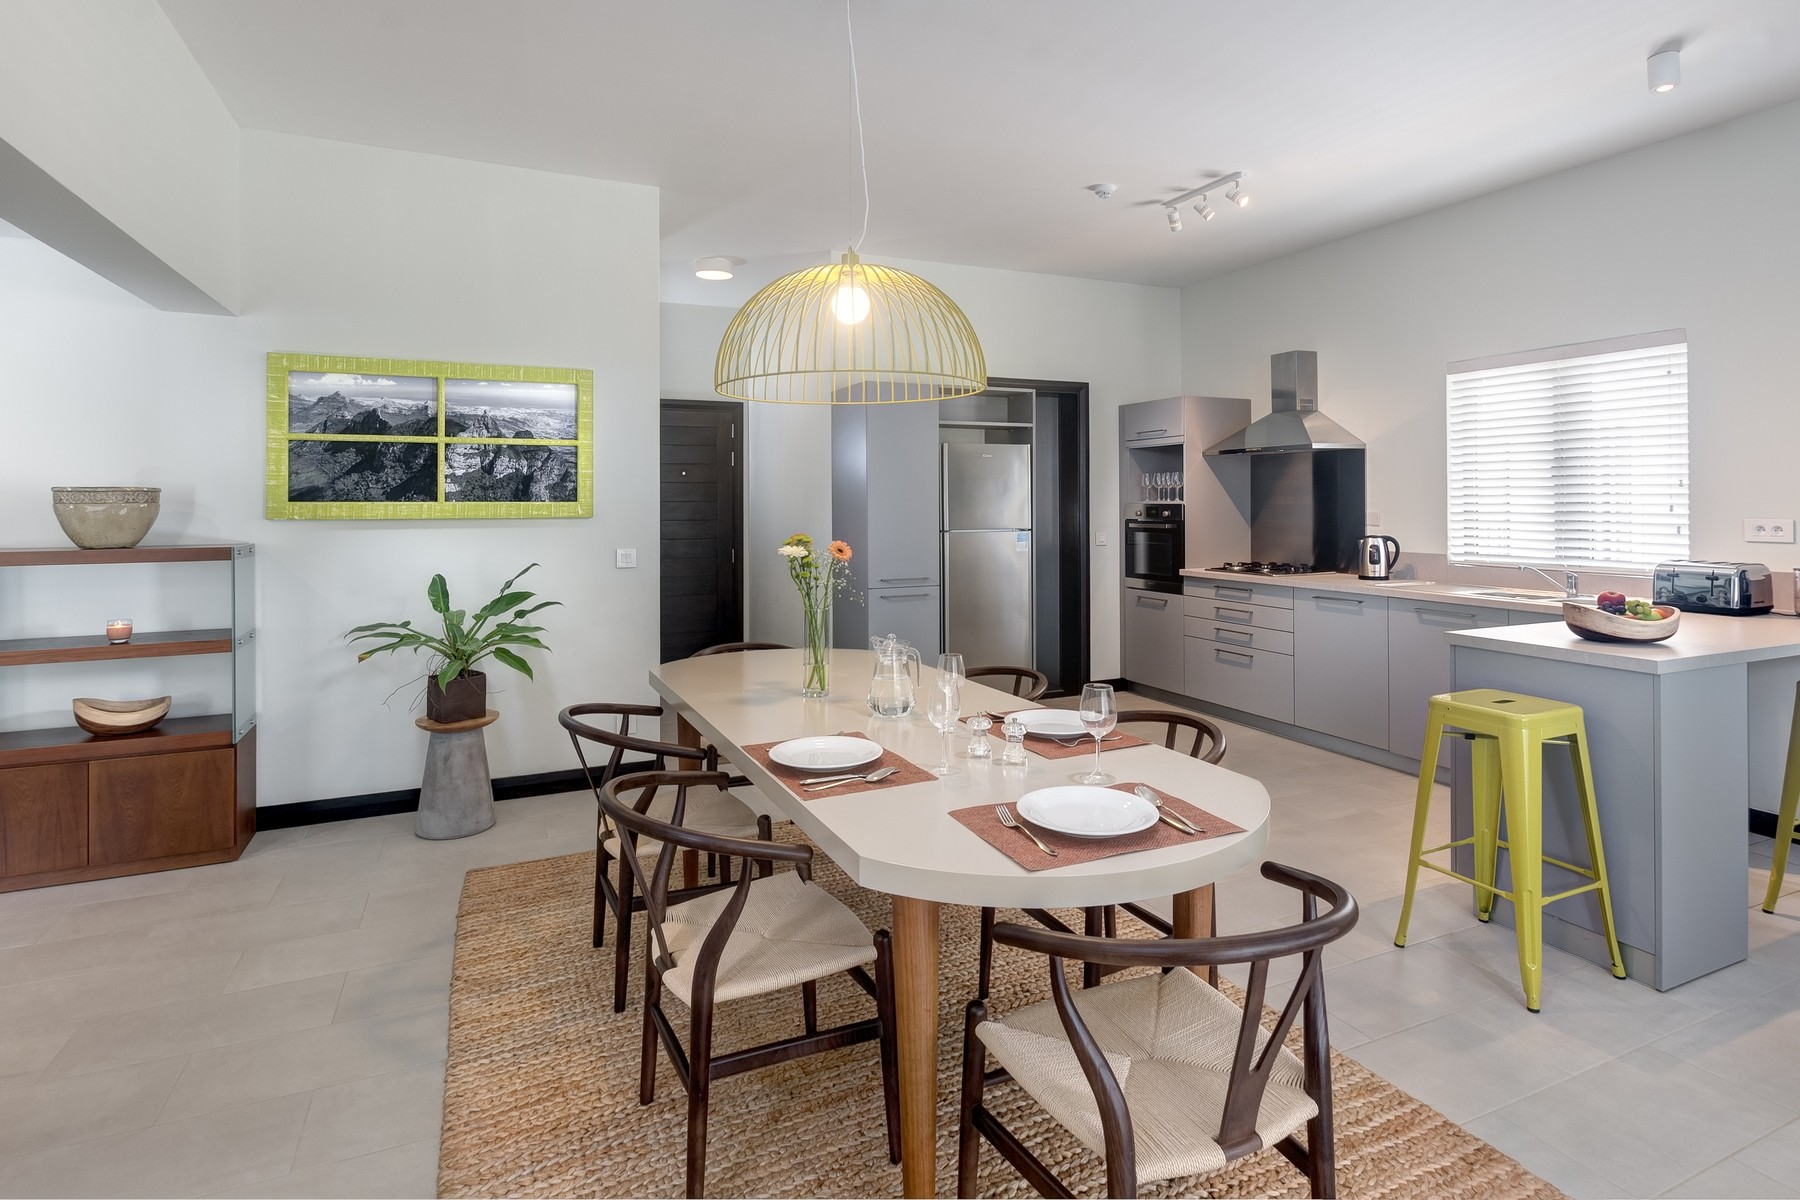 Apartment for Sale at Bagatelle Les Residences - Apartment Bagatelle, Moka 80816 Mauritius